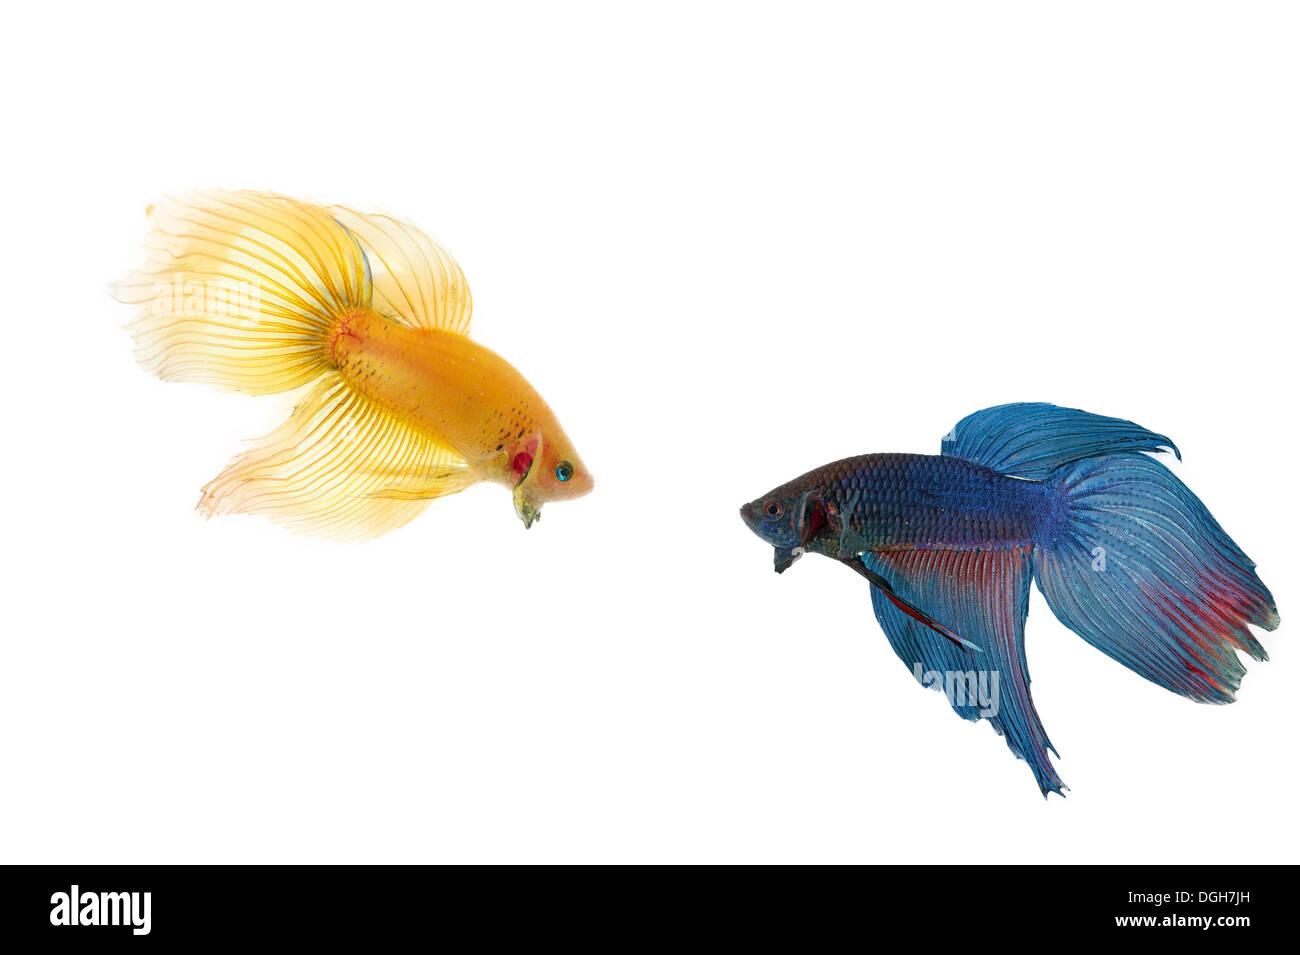 Betta Fish Stock Photos & Betta Fish Stock Images - Alamy